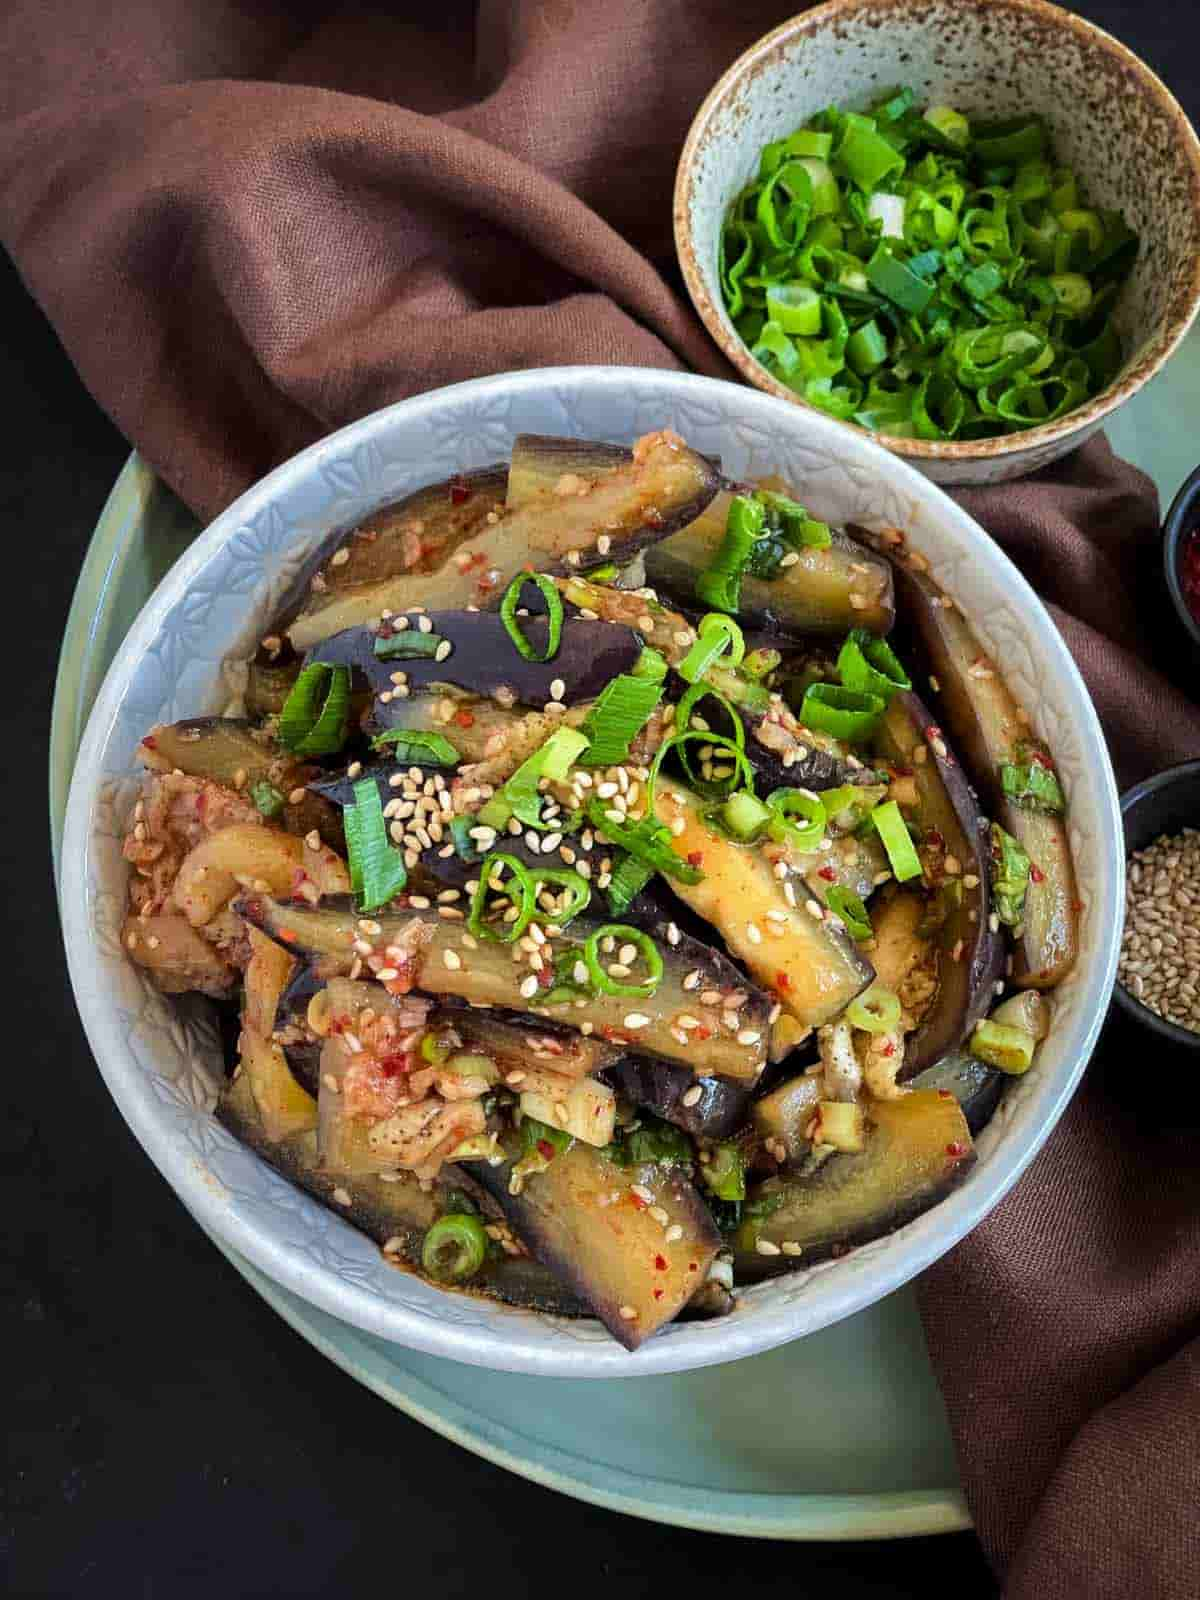 Korean Steamed Eggplant Side Dish - Gaji Namul